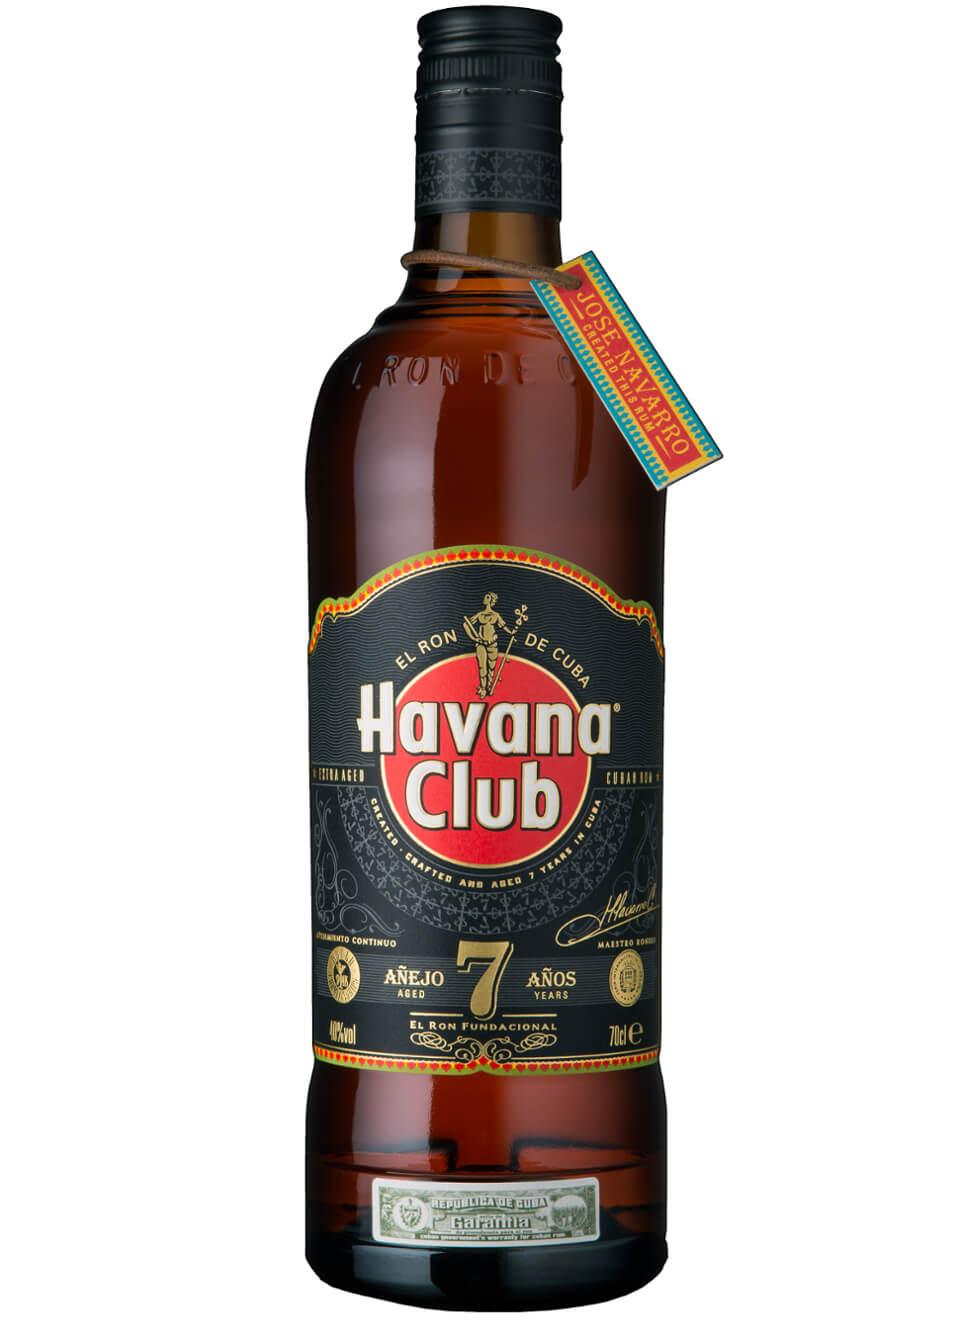 Havana Club Anejo 7 Jahre Rum bei [Trinkgut] ab 26.08.